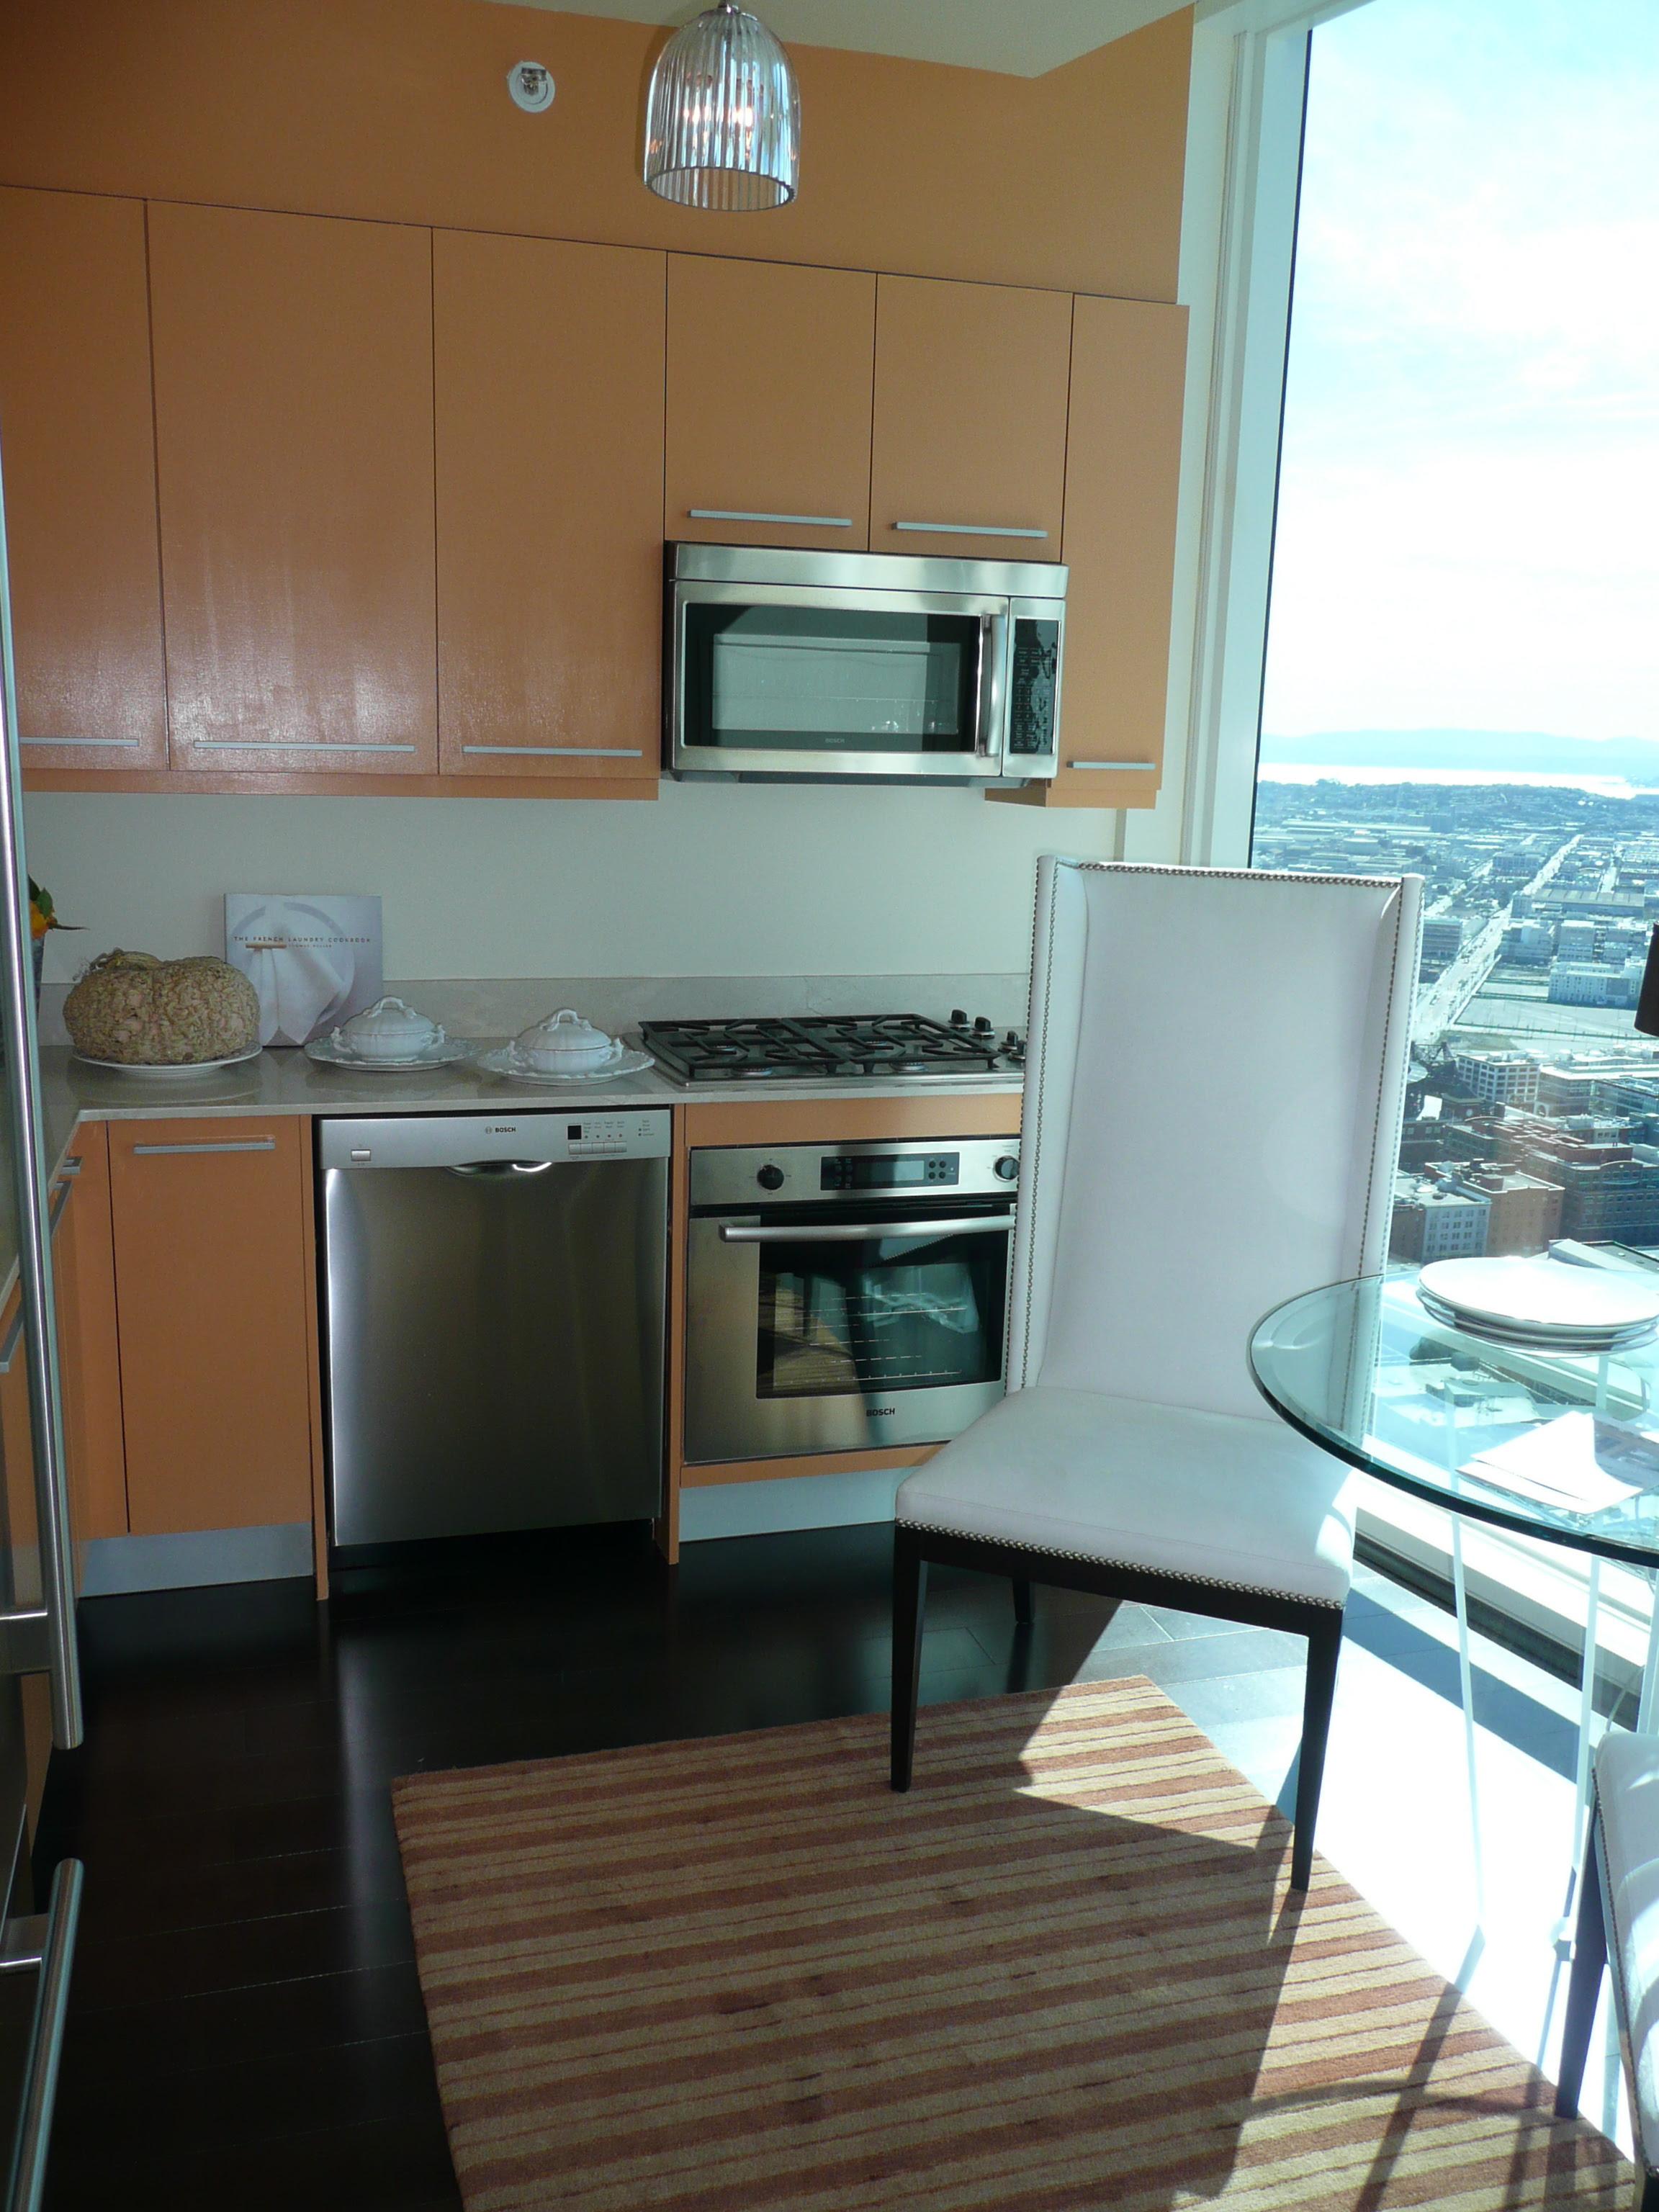 Feng Shui Kitchen & Feng Shui Kitchen Colors: Home Buyers ...